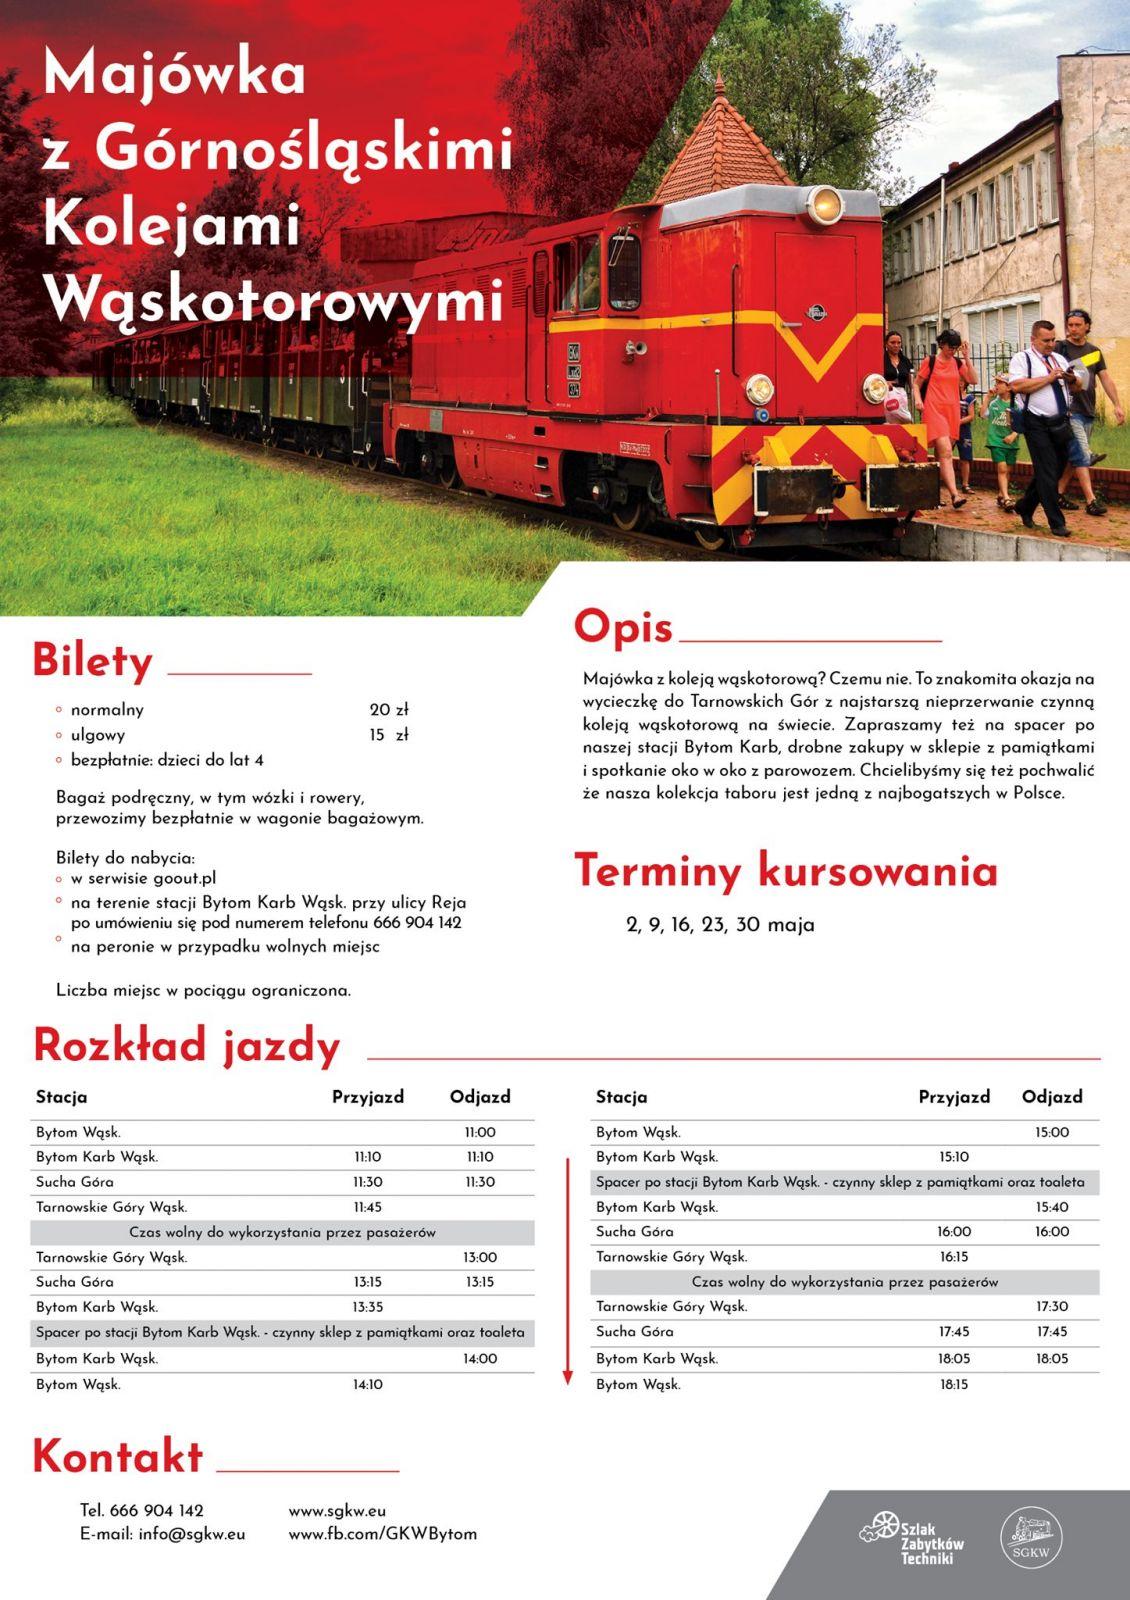 Archiwum SGKW - Krzysztof Turko